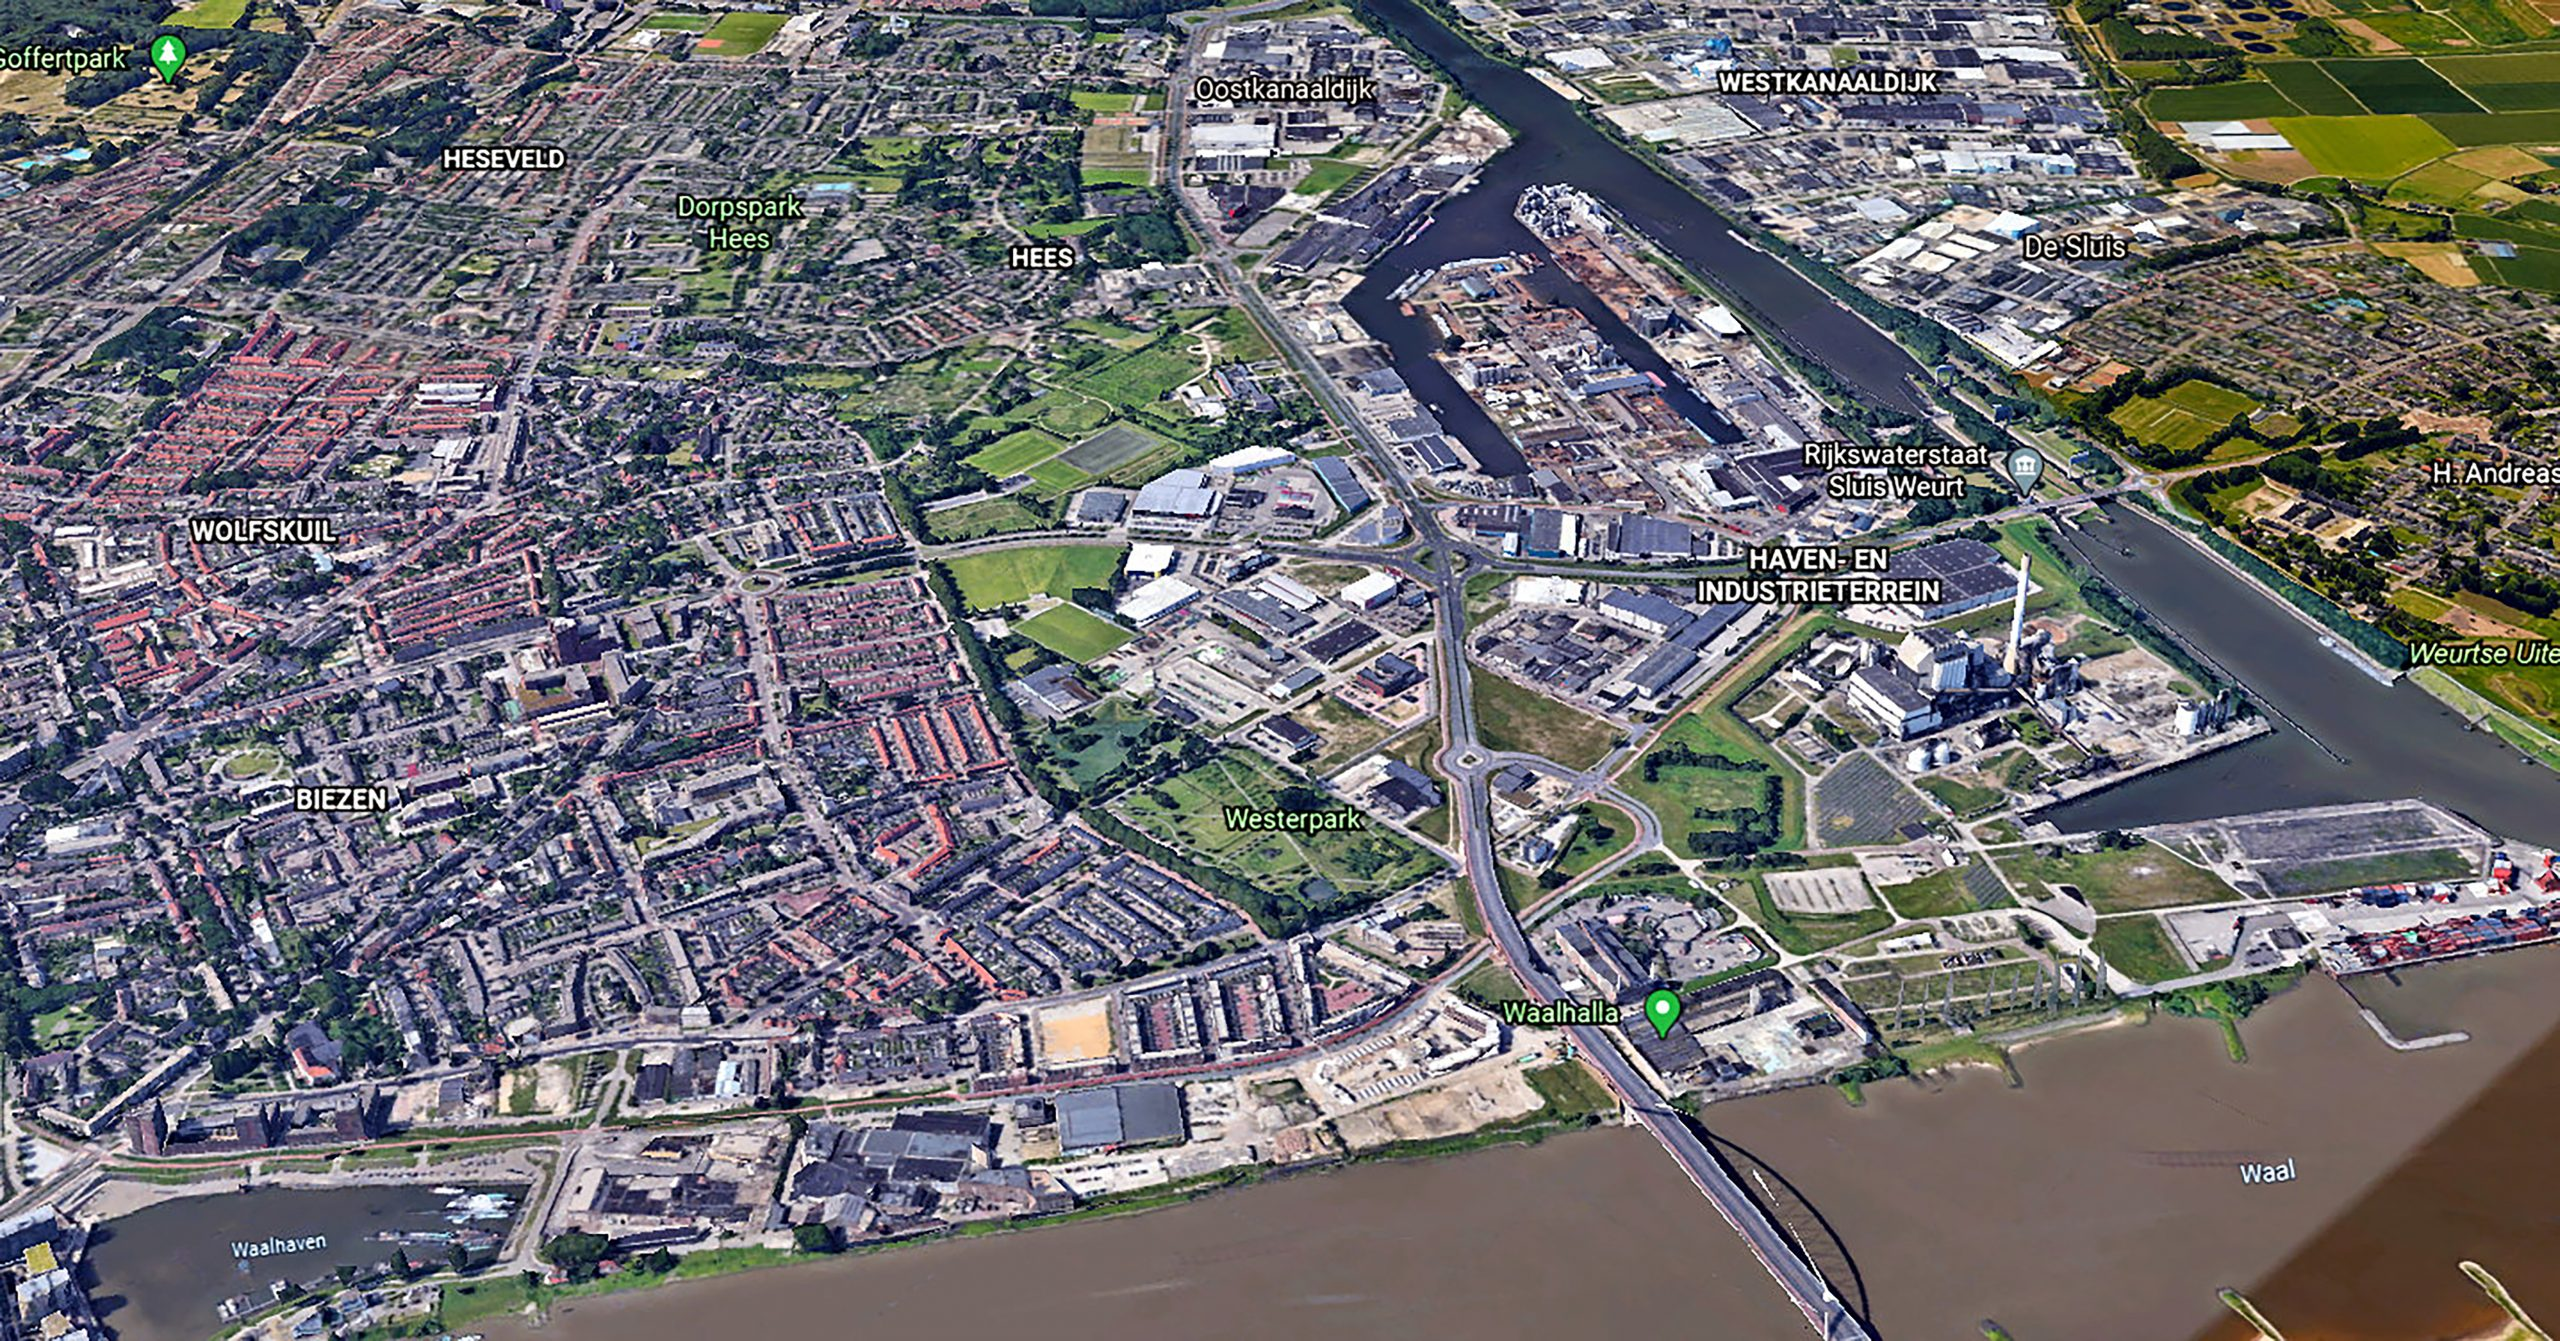 Luchtkwaliteit Nijmegen West en Weurt